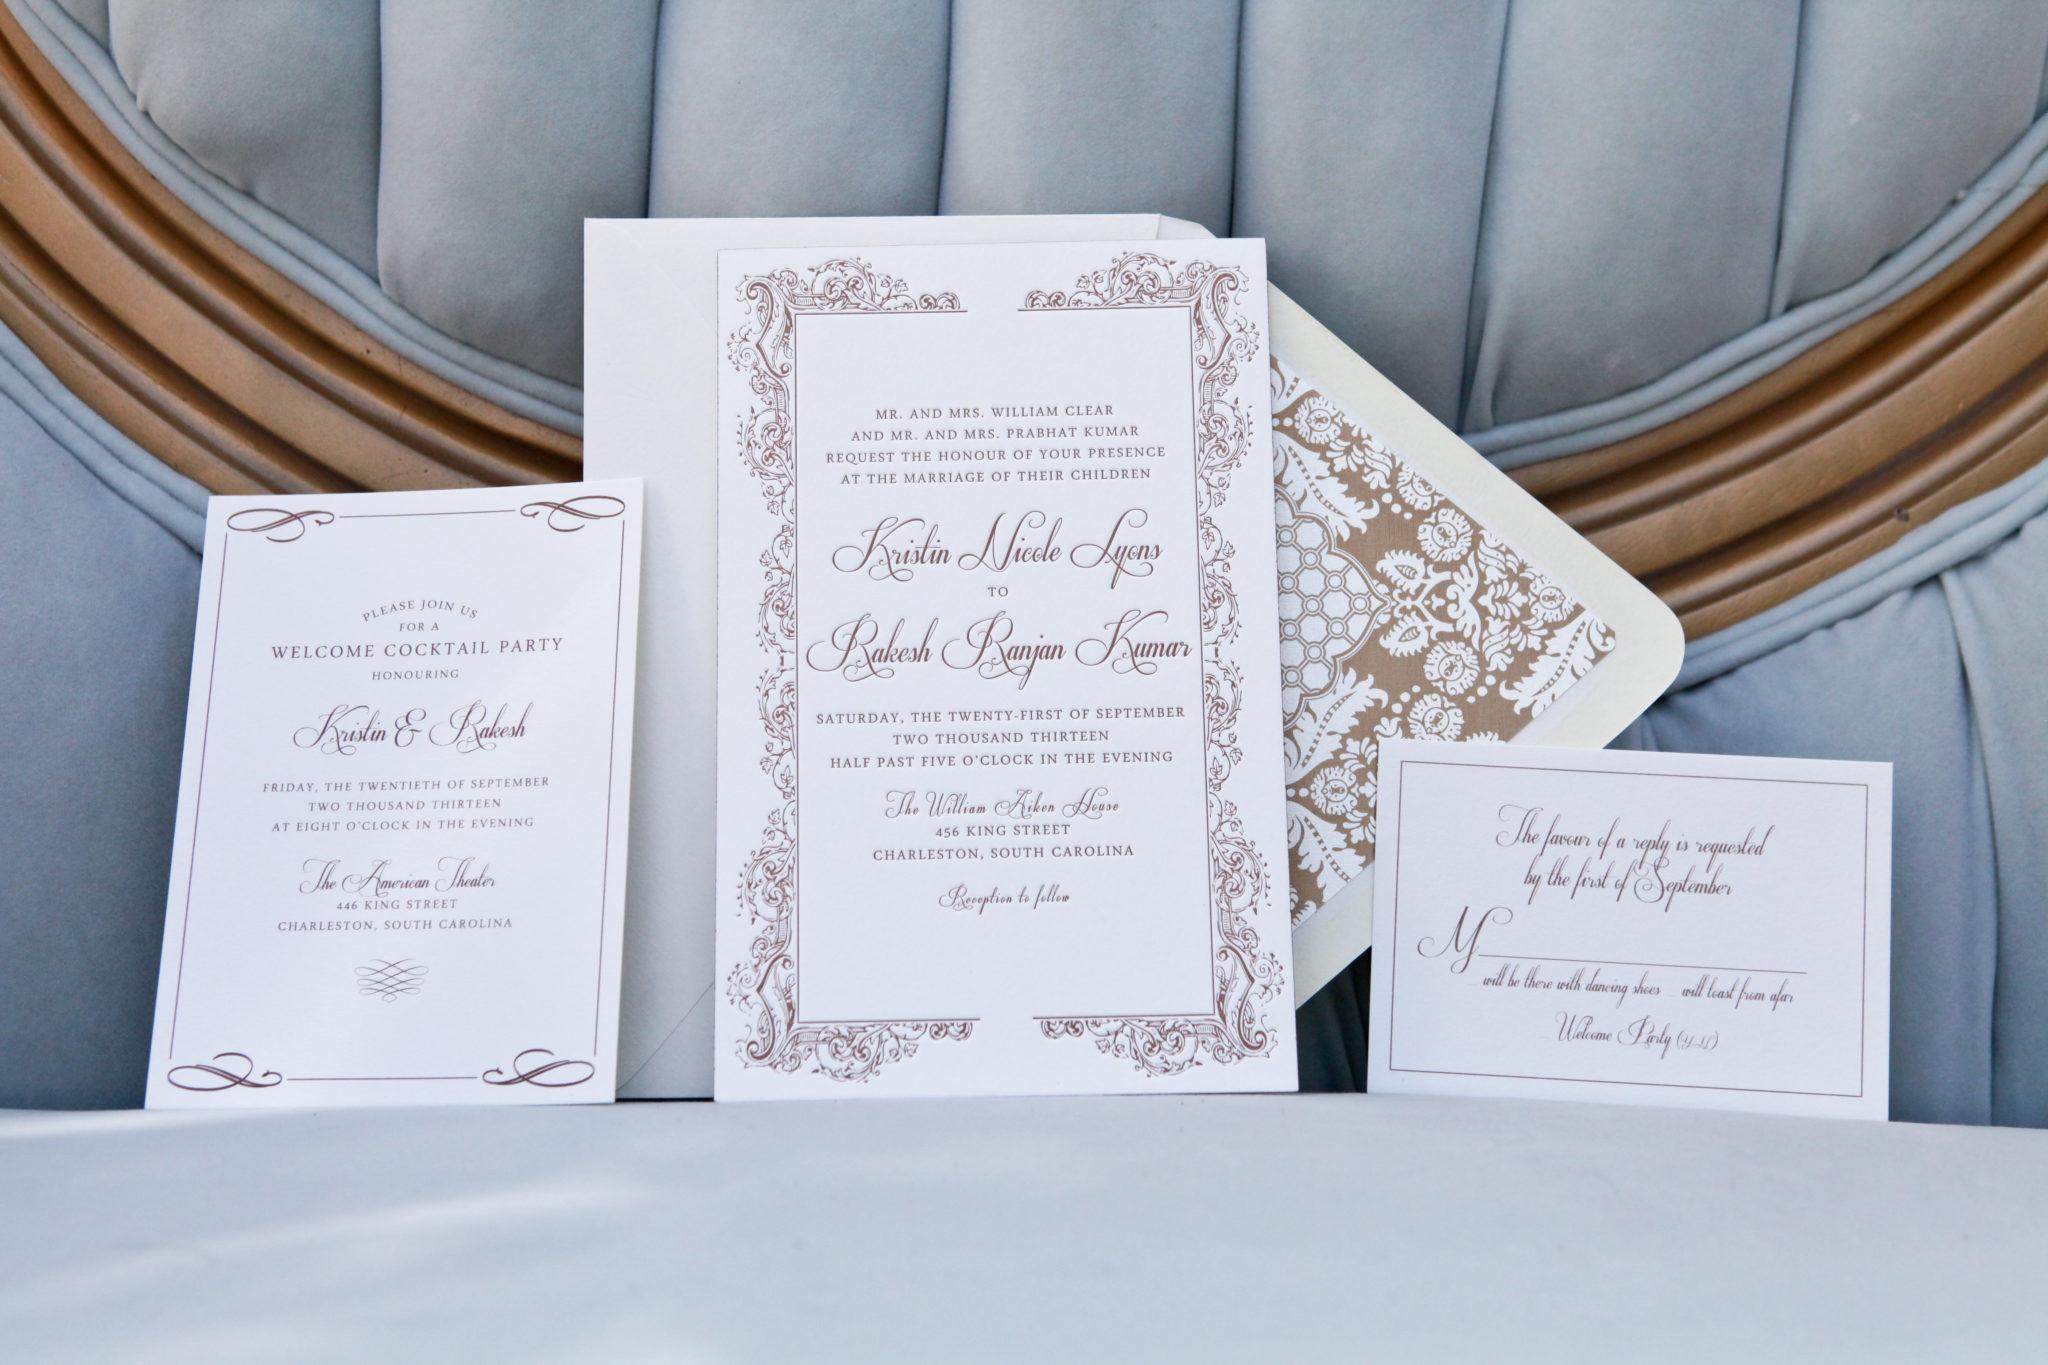 Customized Wedding Invitations: Custom Wedding Invitation Dodeline Design Charleston SC